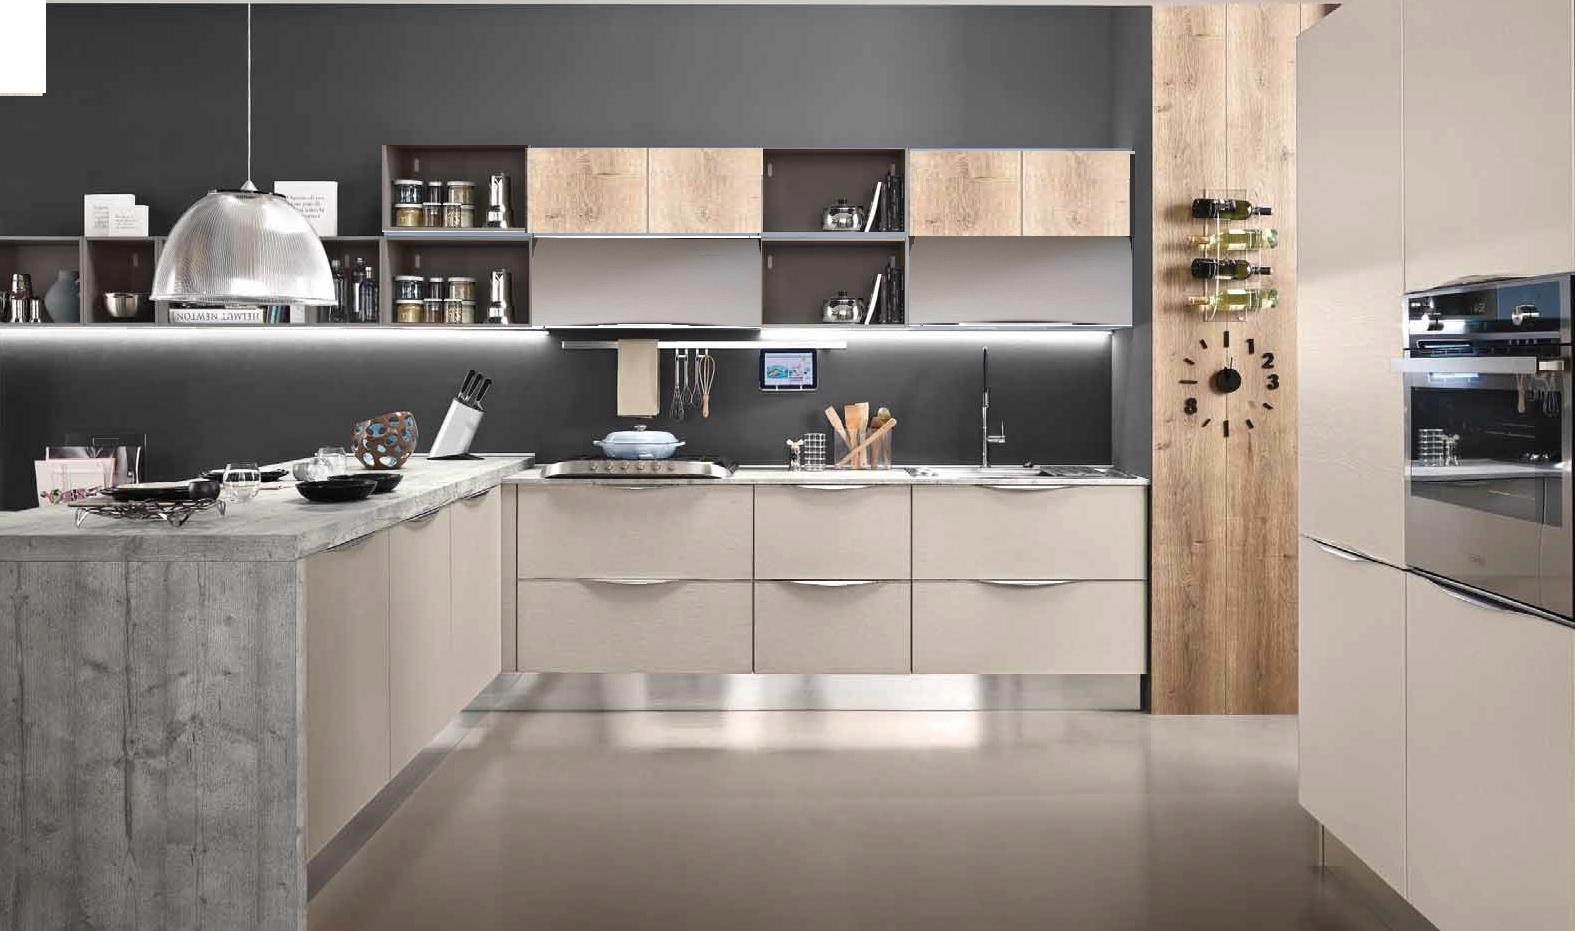 Emejing Cucina Rovere Grigio Photos - Ideas & Design 2017 ...